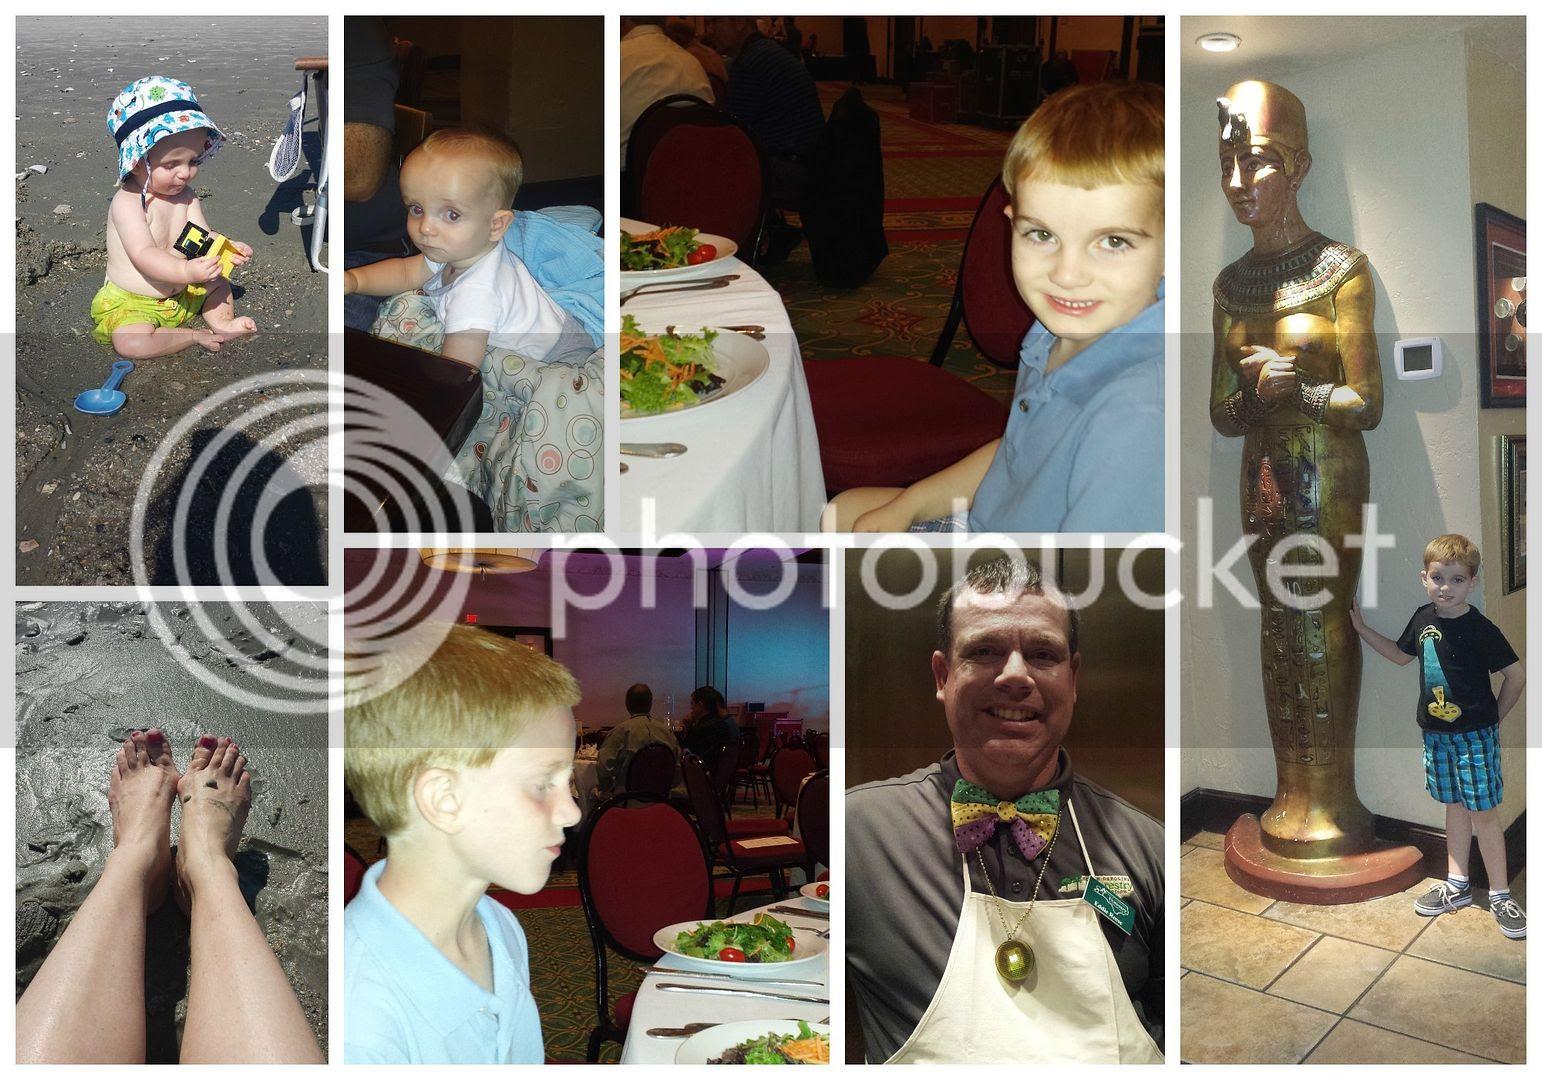 photo October.collage6_zpsnlc2wf0r.jpg